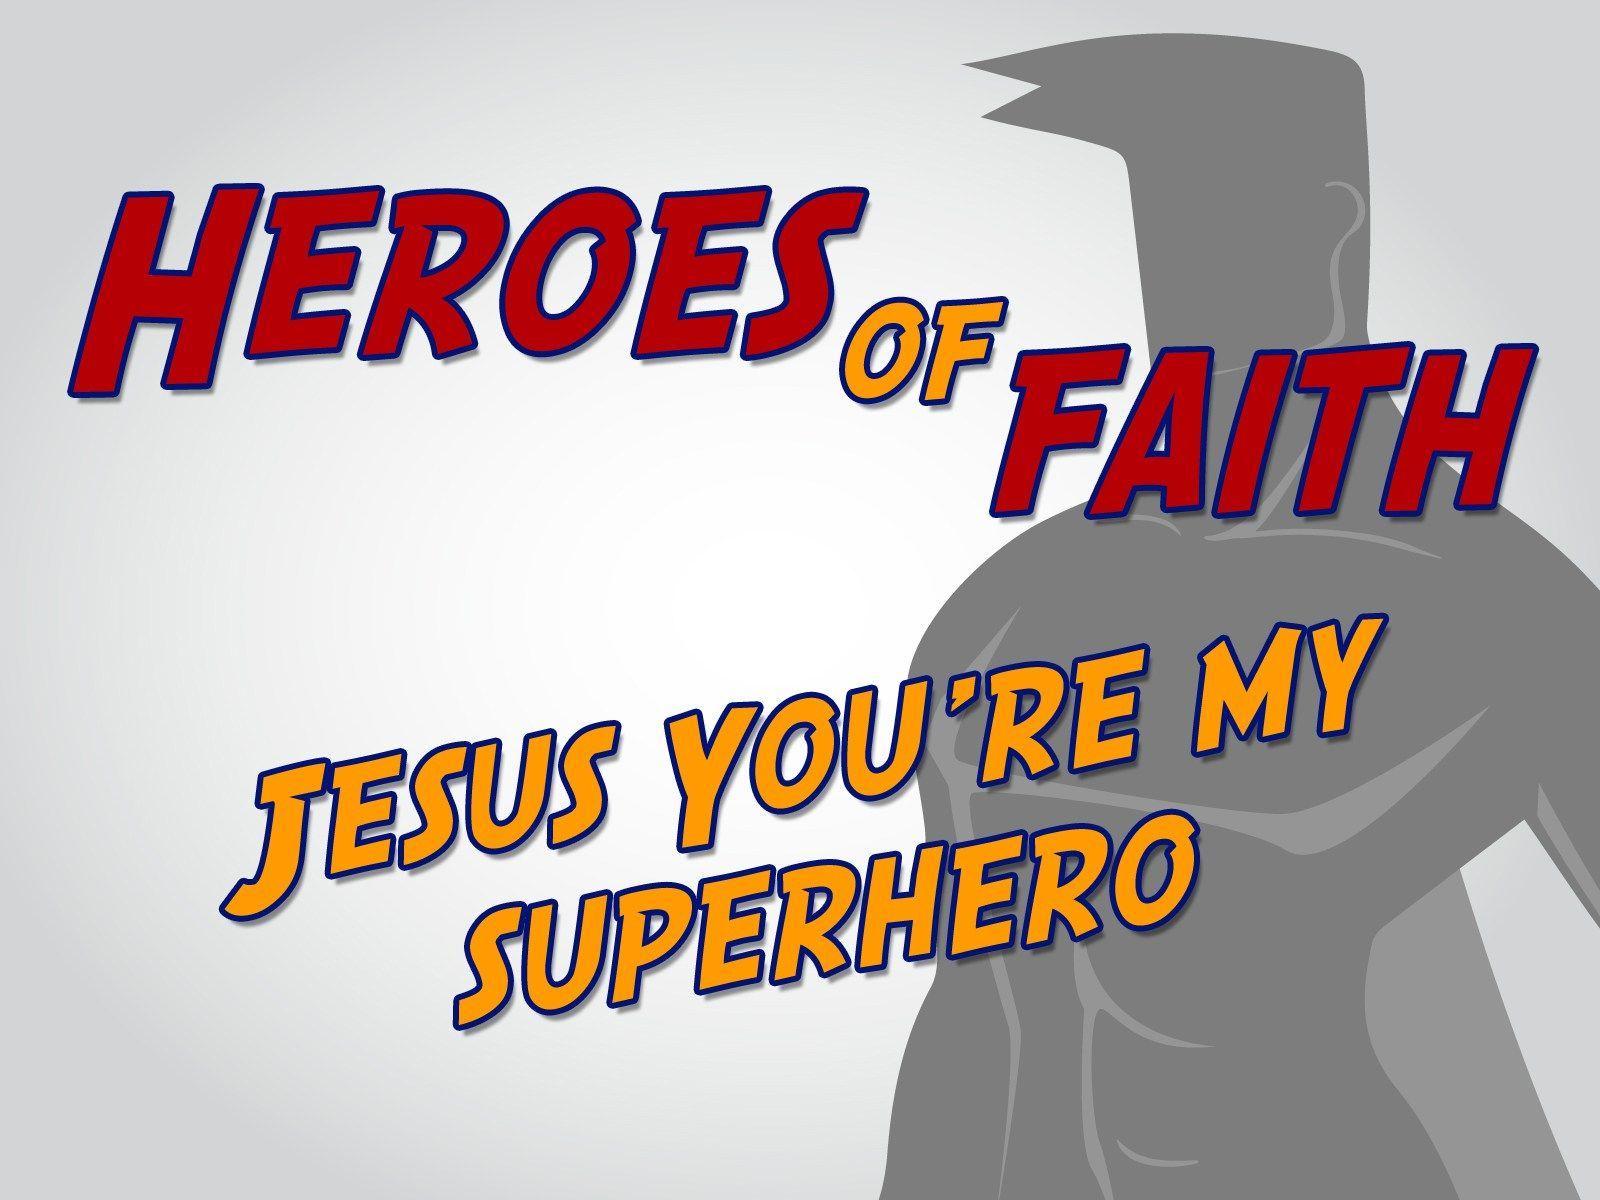 Jesus You're My Superhero' Childrens Lesson | Sunday School